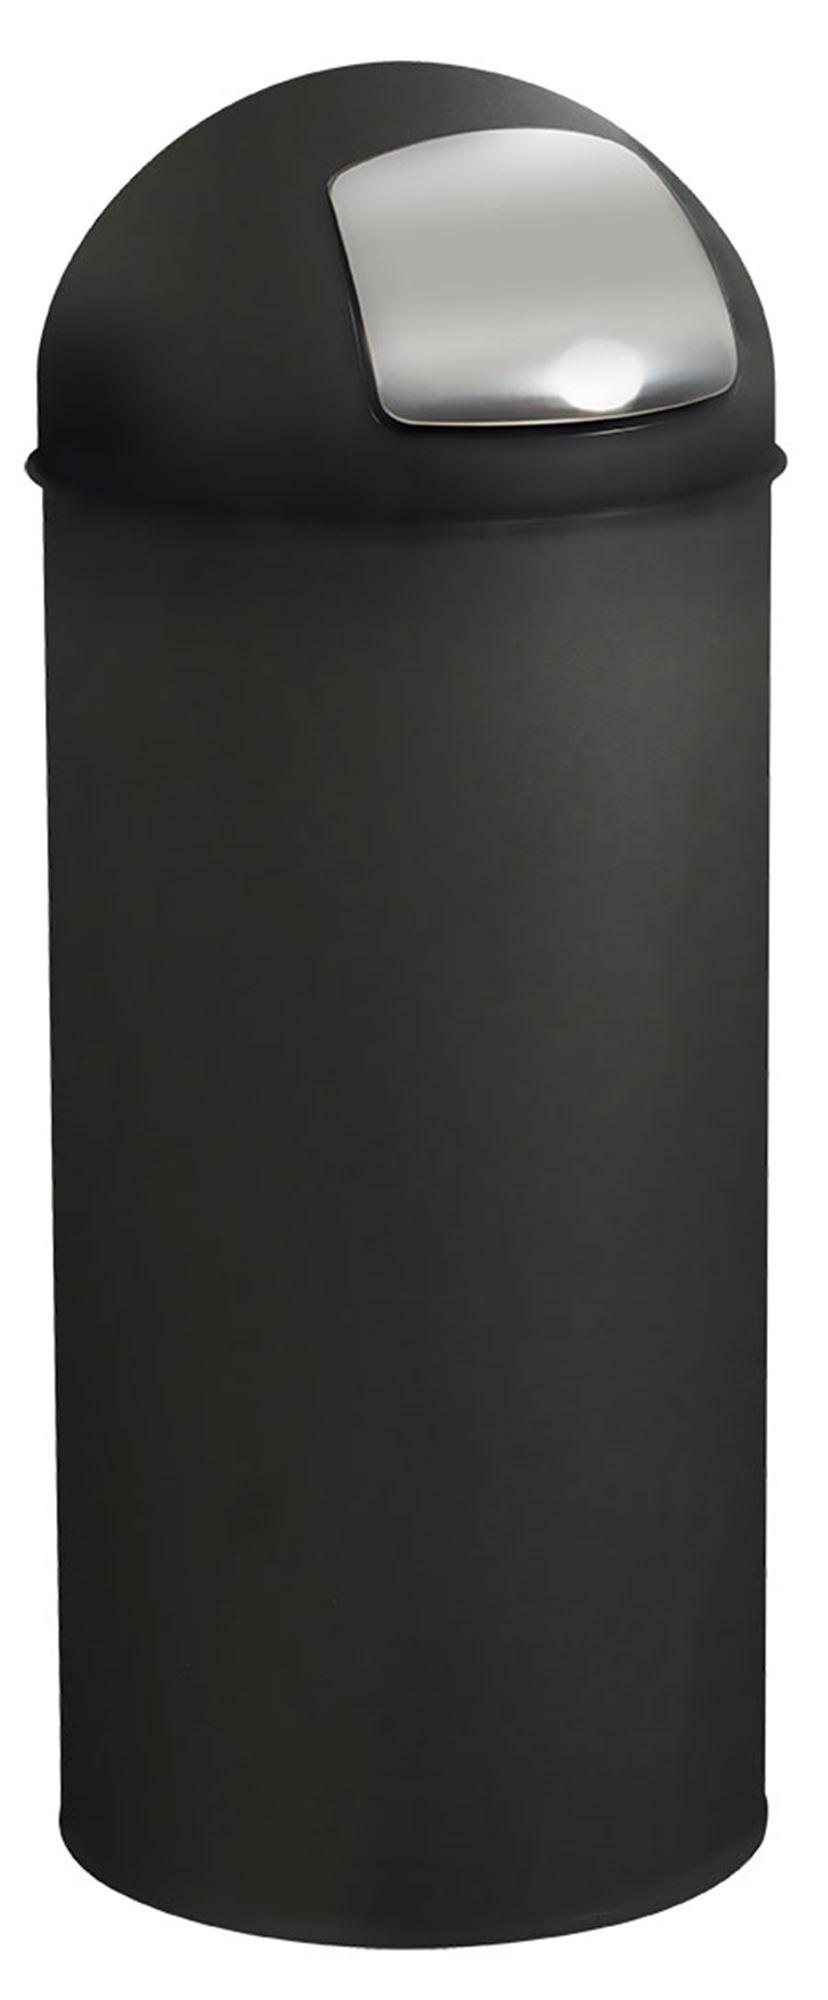 Poubelle rossignol grand volume noir avec trappe for Poubelle cuisine rossignol